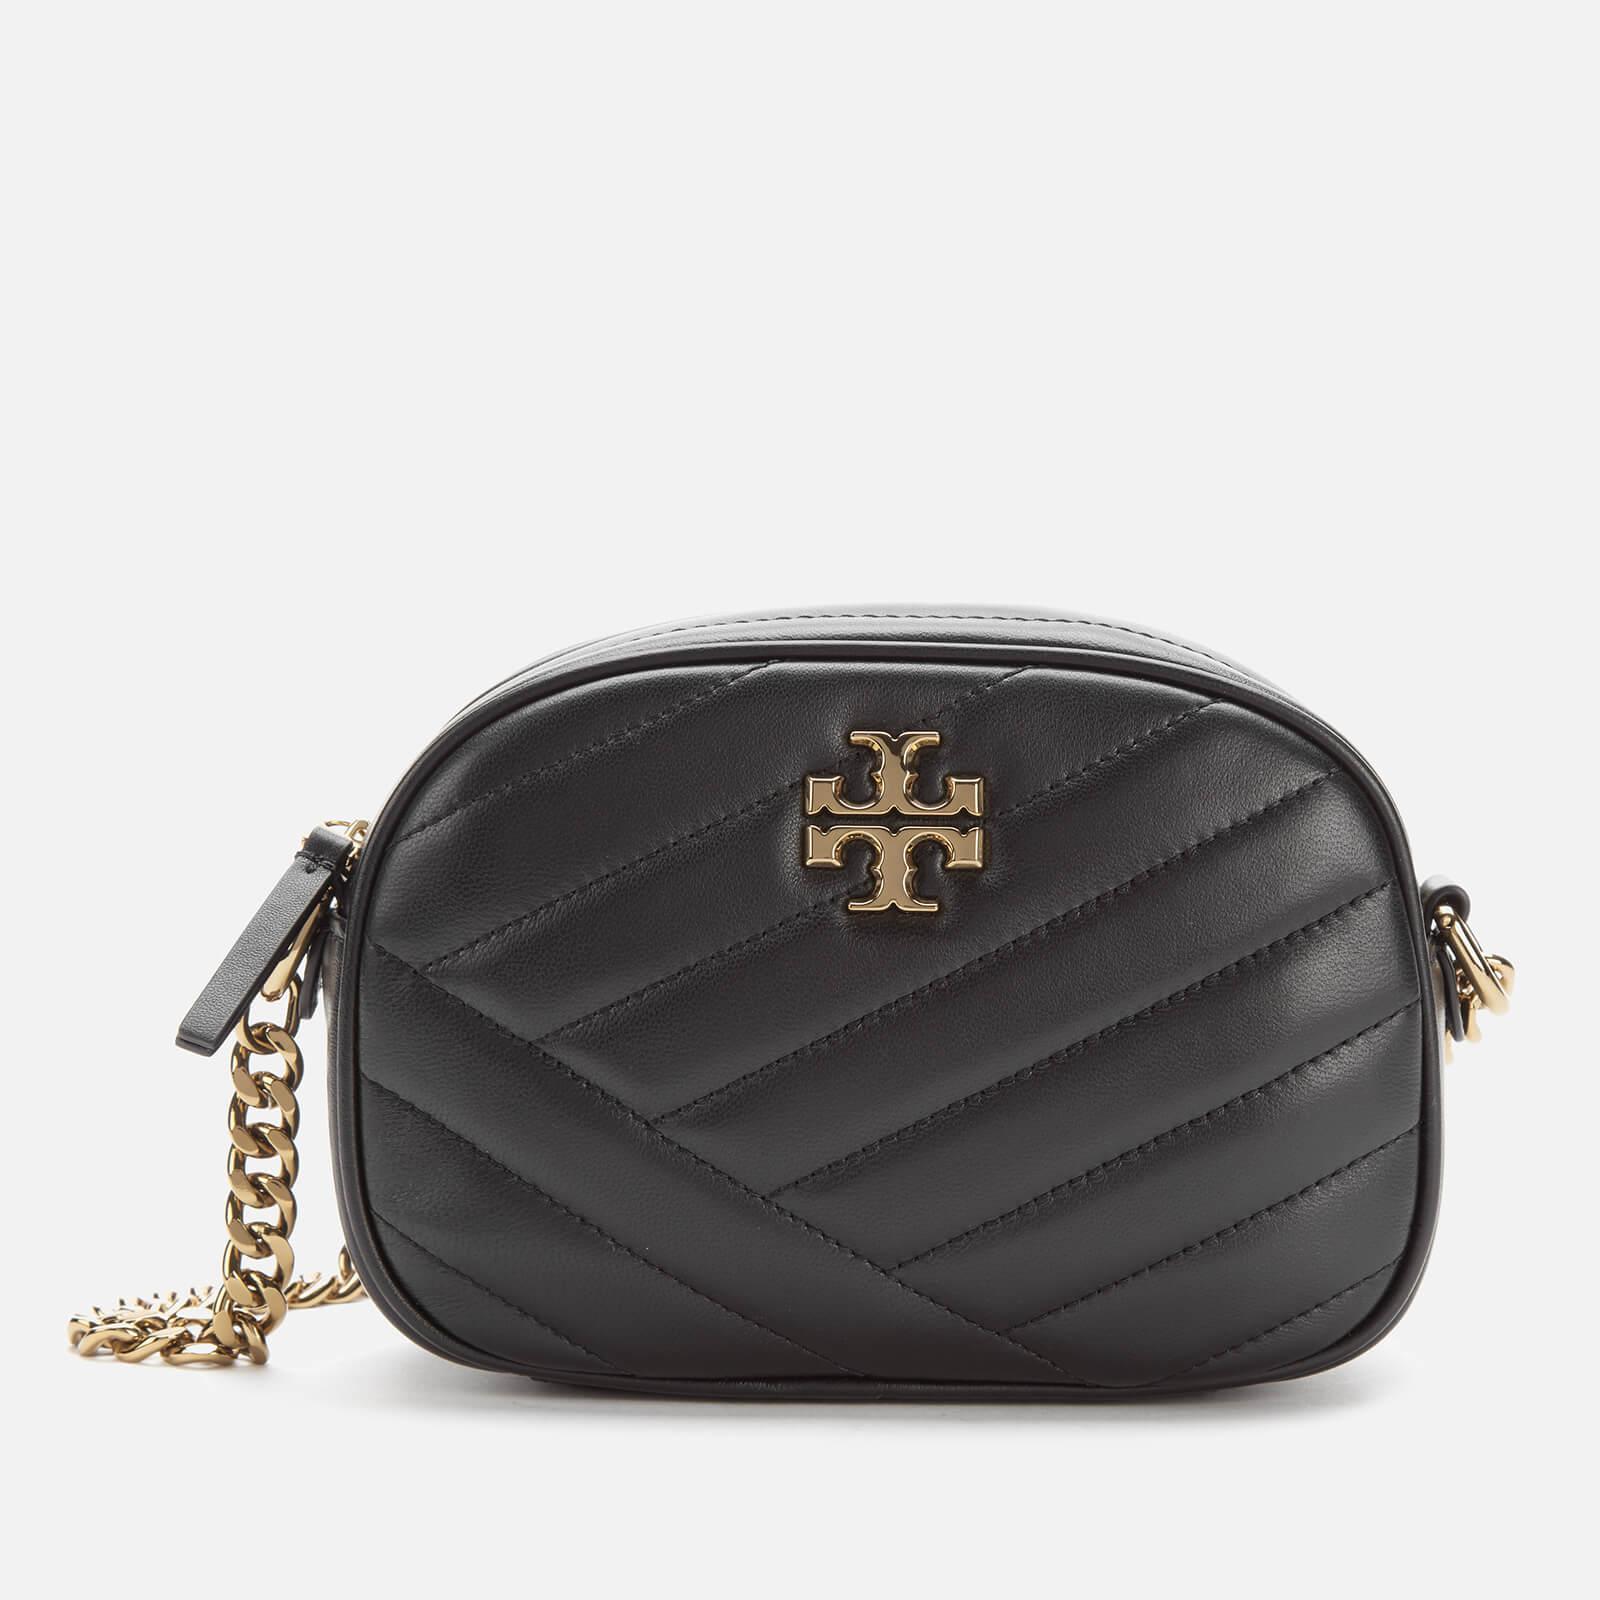 Tory Burch Women's Kira Chevron Small Camera Bag - Black